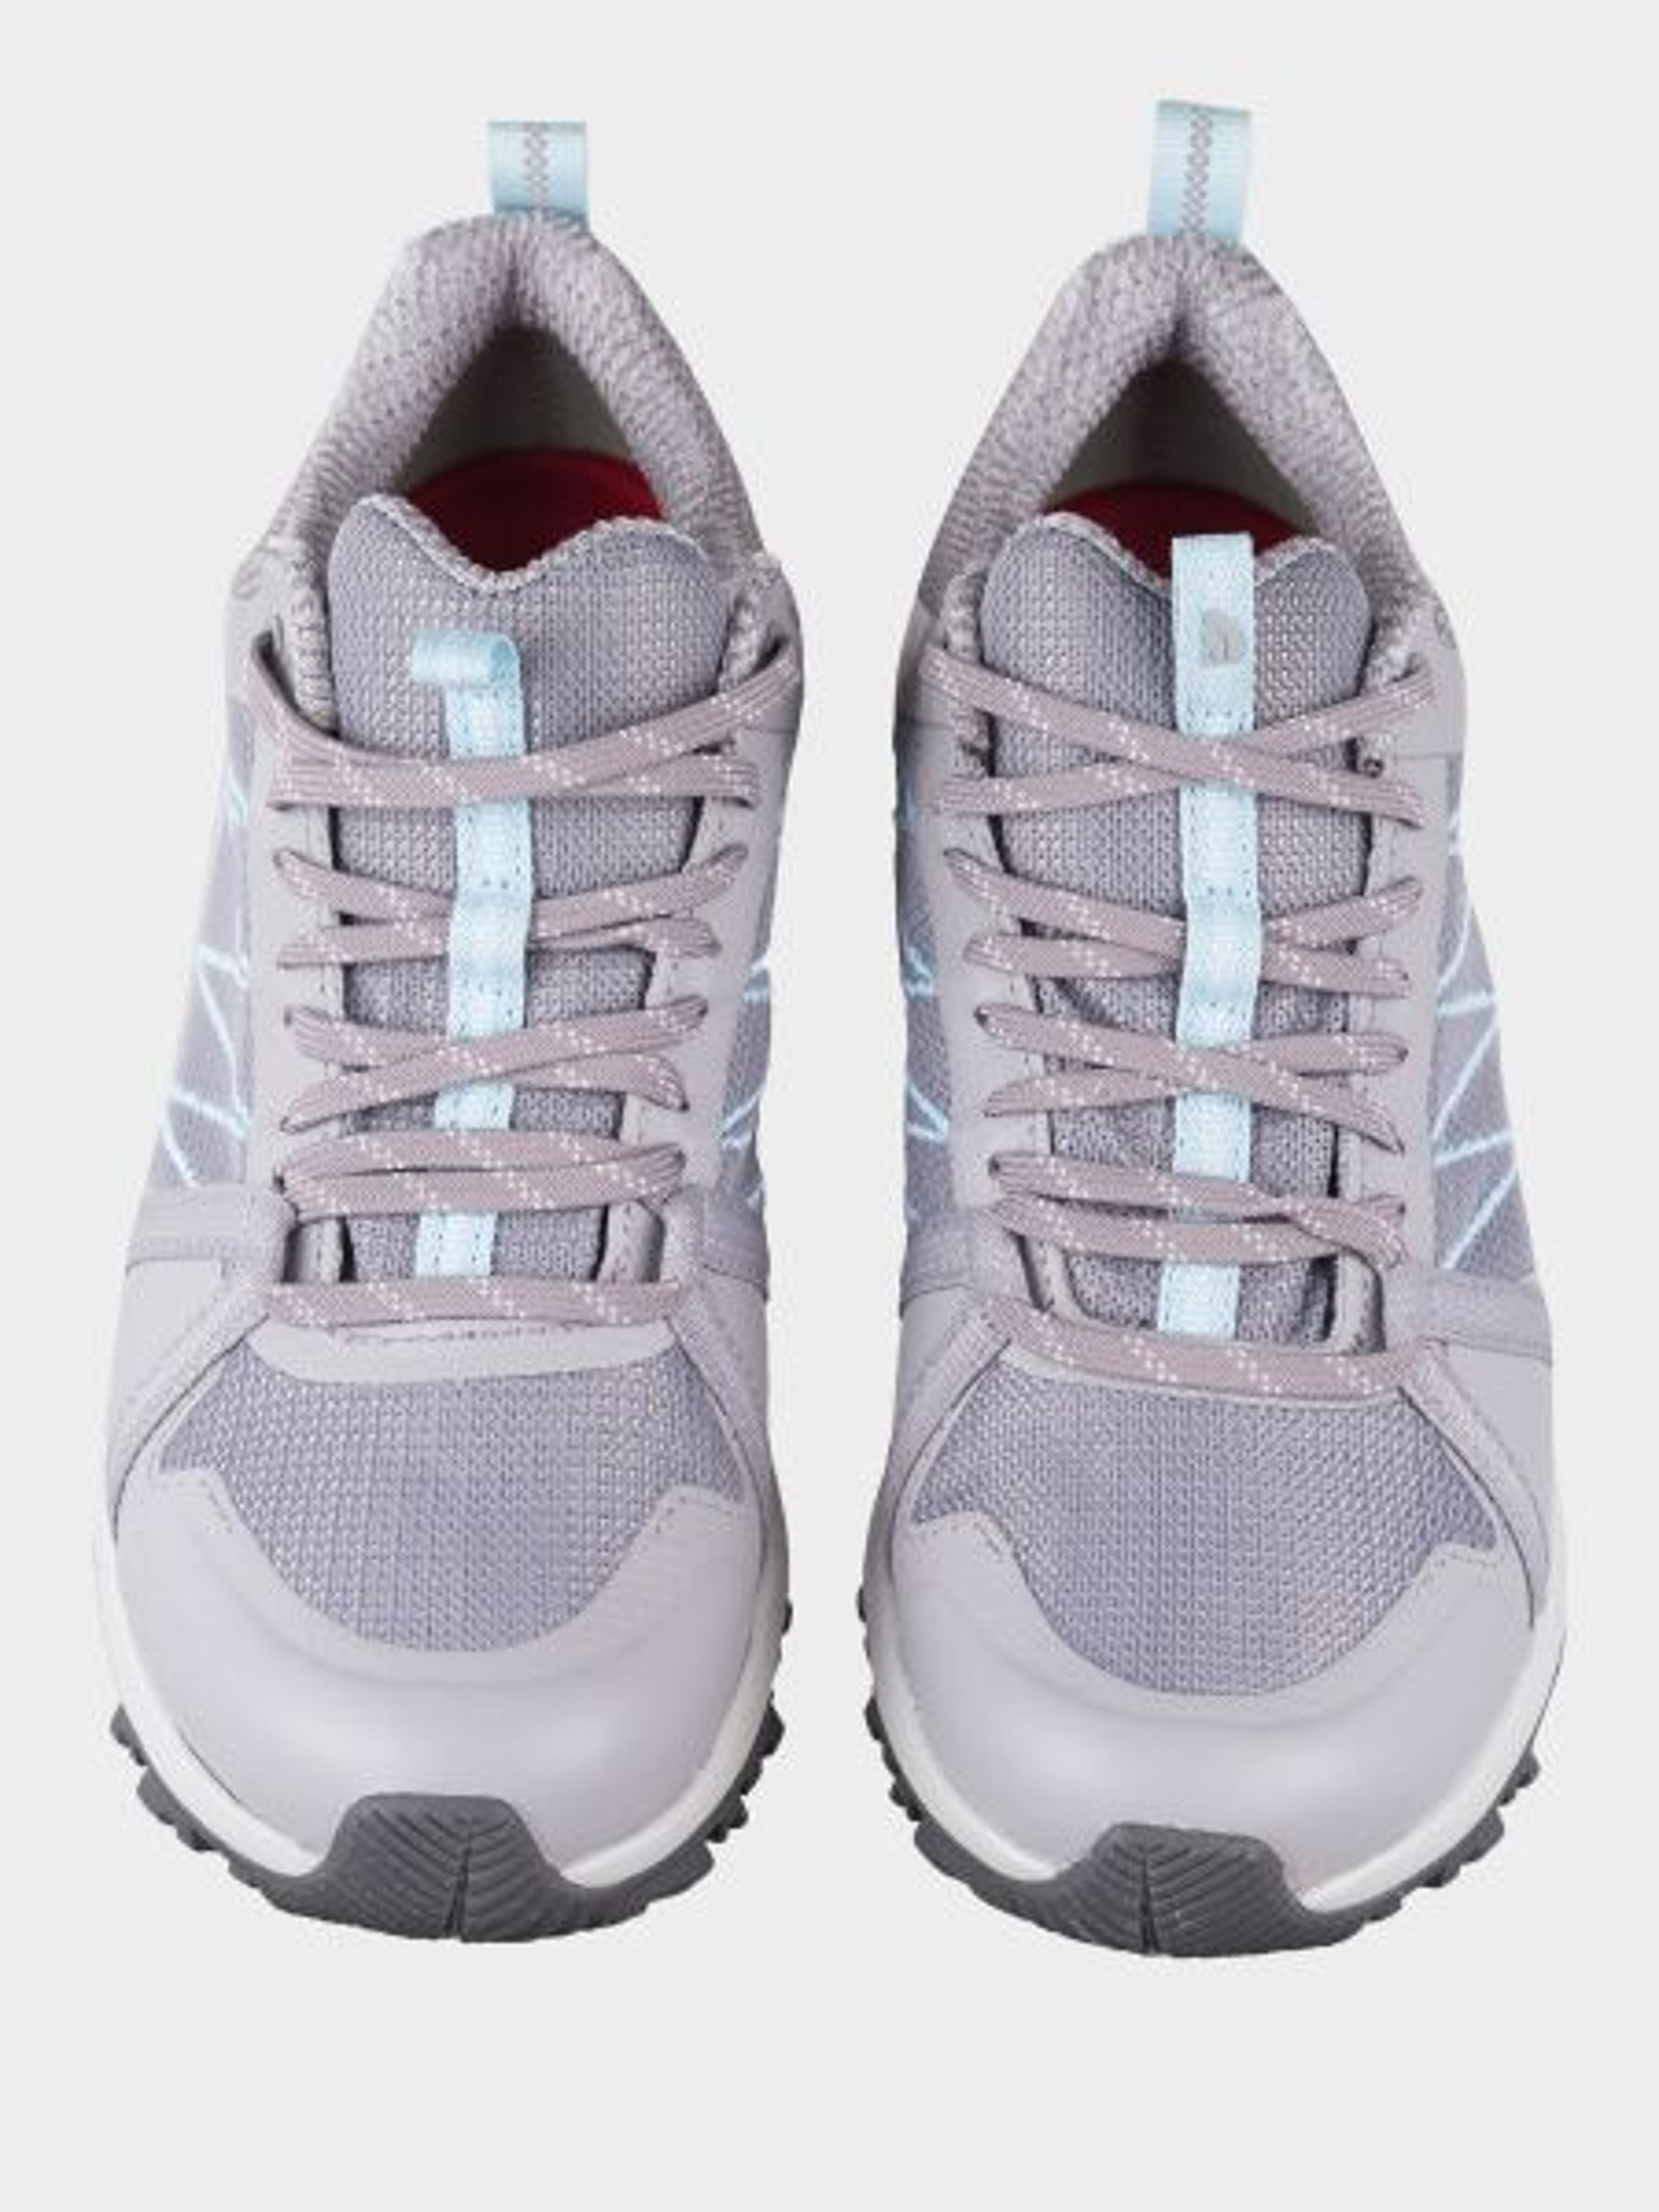 Кроссовки женские The North Face Litewave Fastpack II GTX NO9784 обувь бренда, 2017